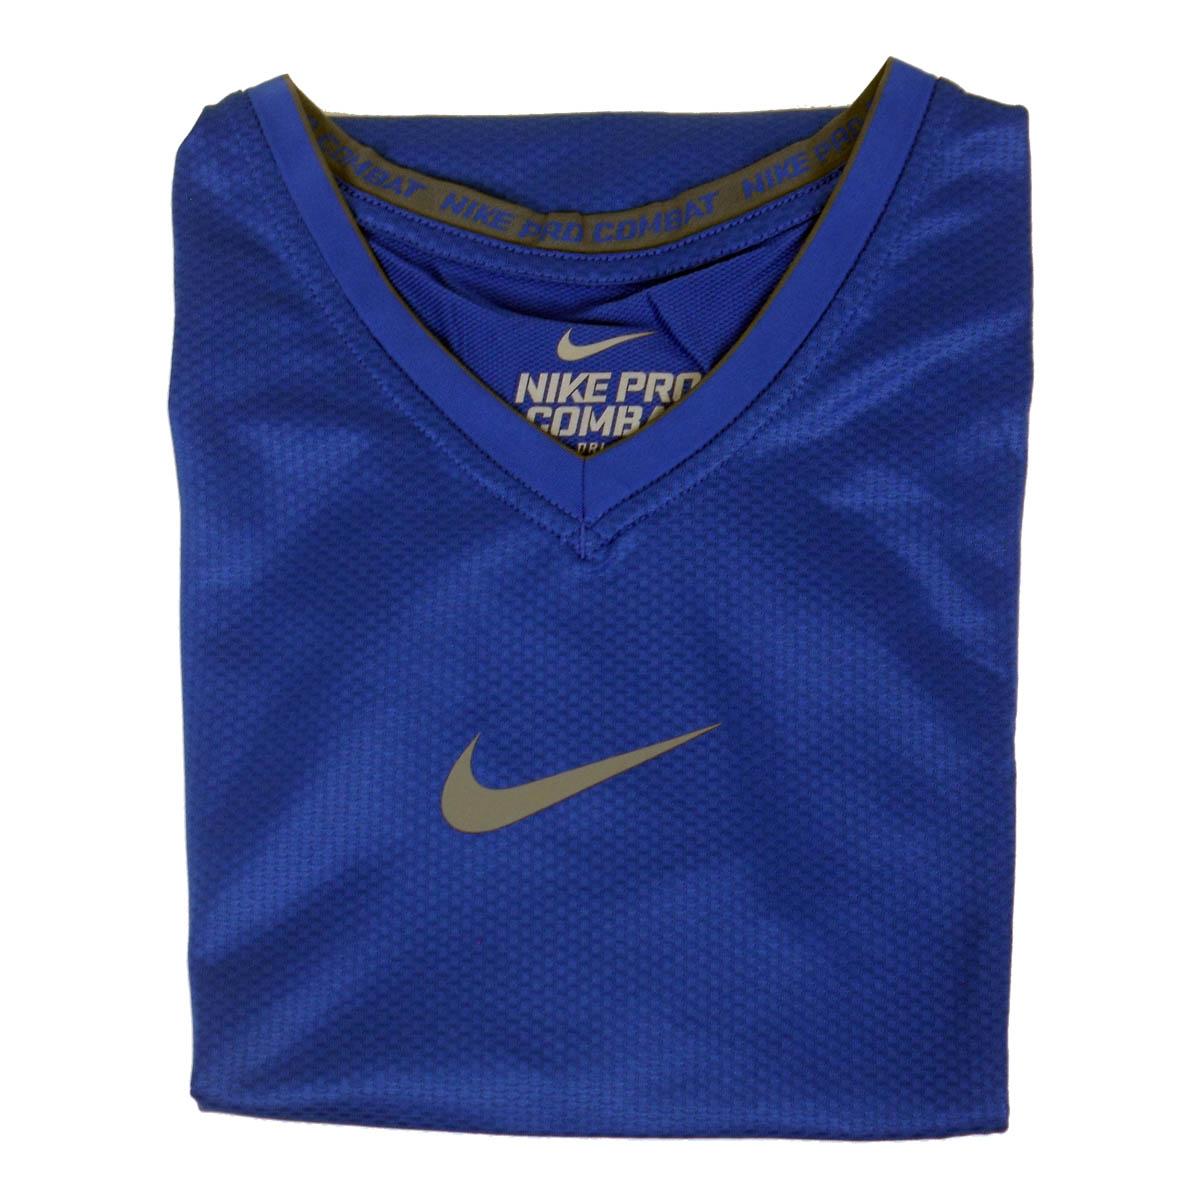 Nike Pro Combat Hypercool Sports Mens Training Vest Compression Baselayer Top